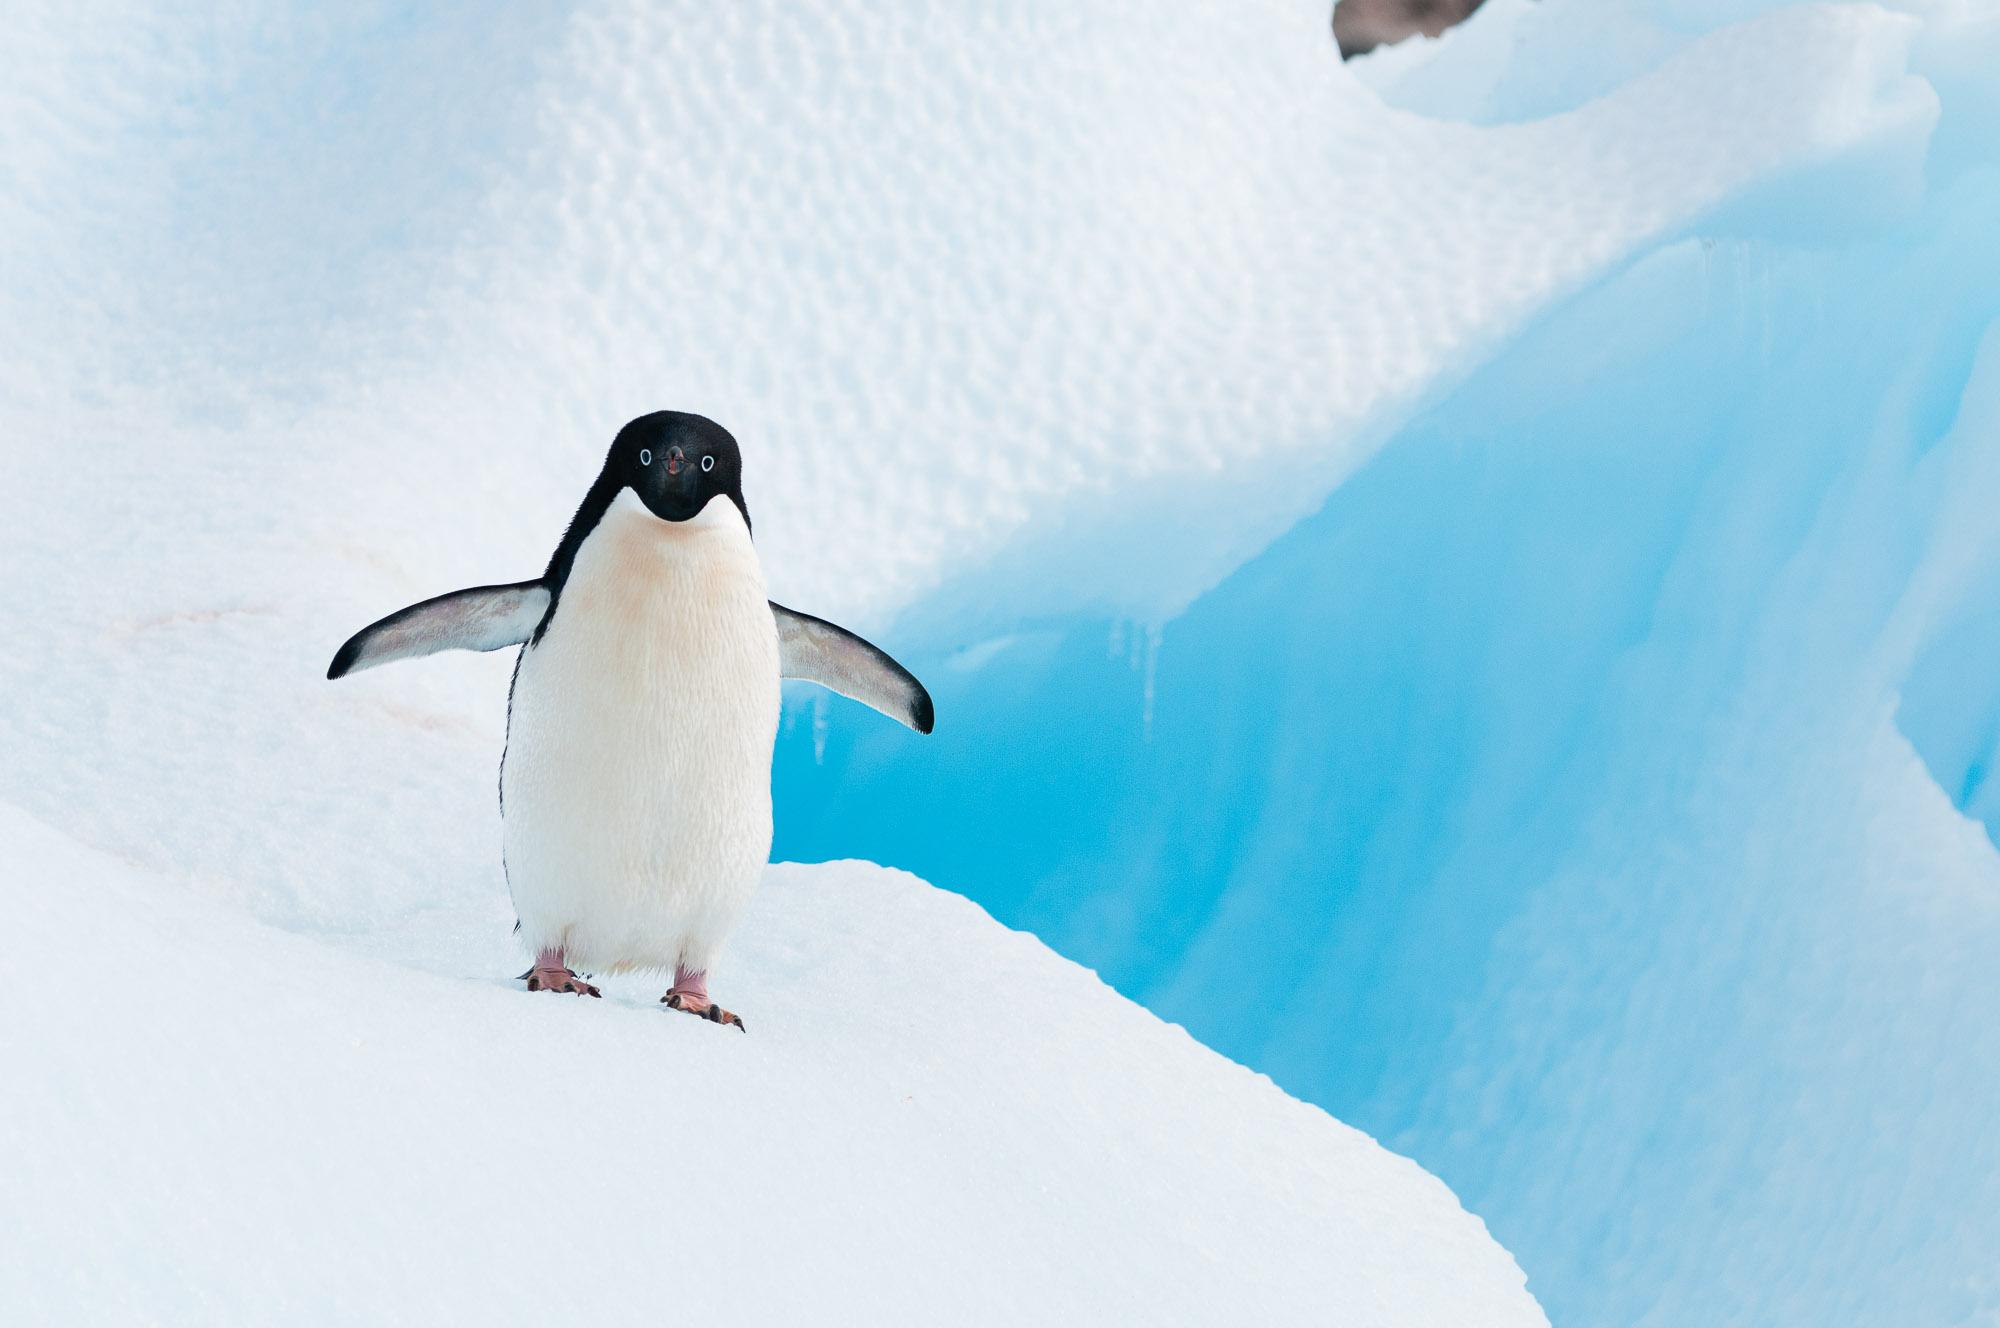 Adélie penguin, on iceberg, Antarctic Peninsula. © www.thomaspickard.com